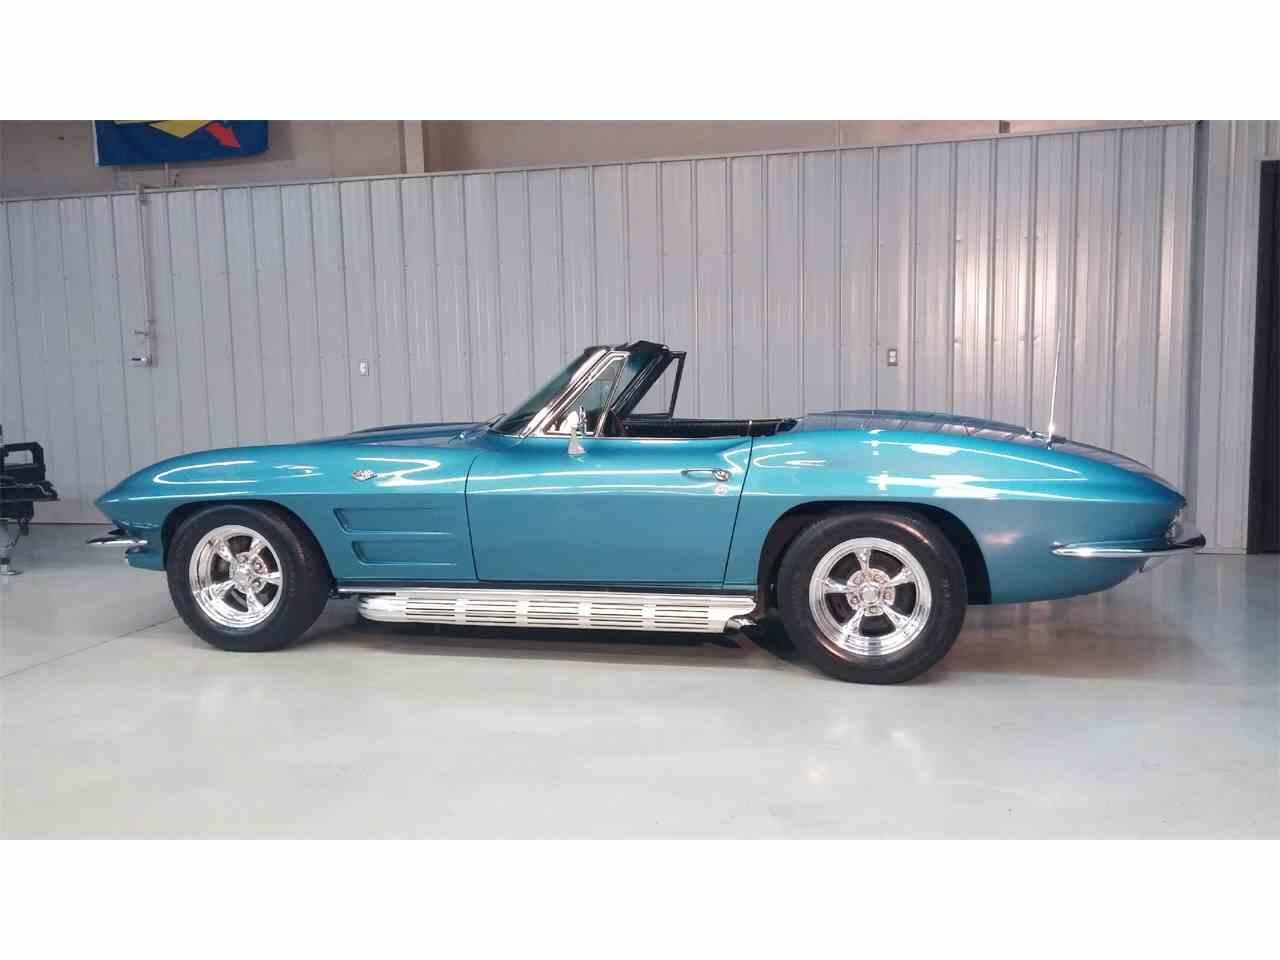 Corvette 1964 chevrolet corvette : 1964 Chevrolet Corvette for Sale | ClassicCars.com | CC-1042180